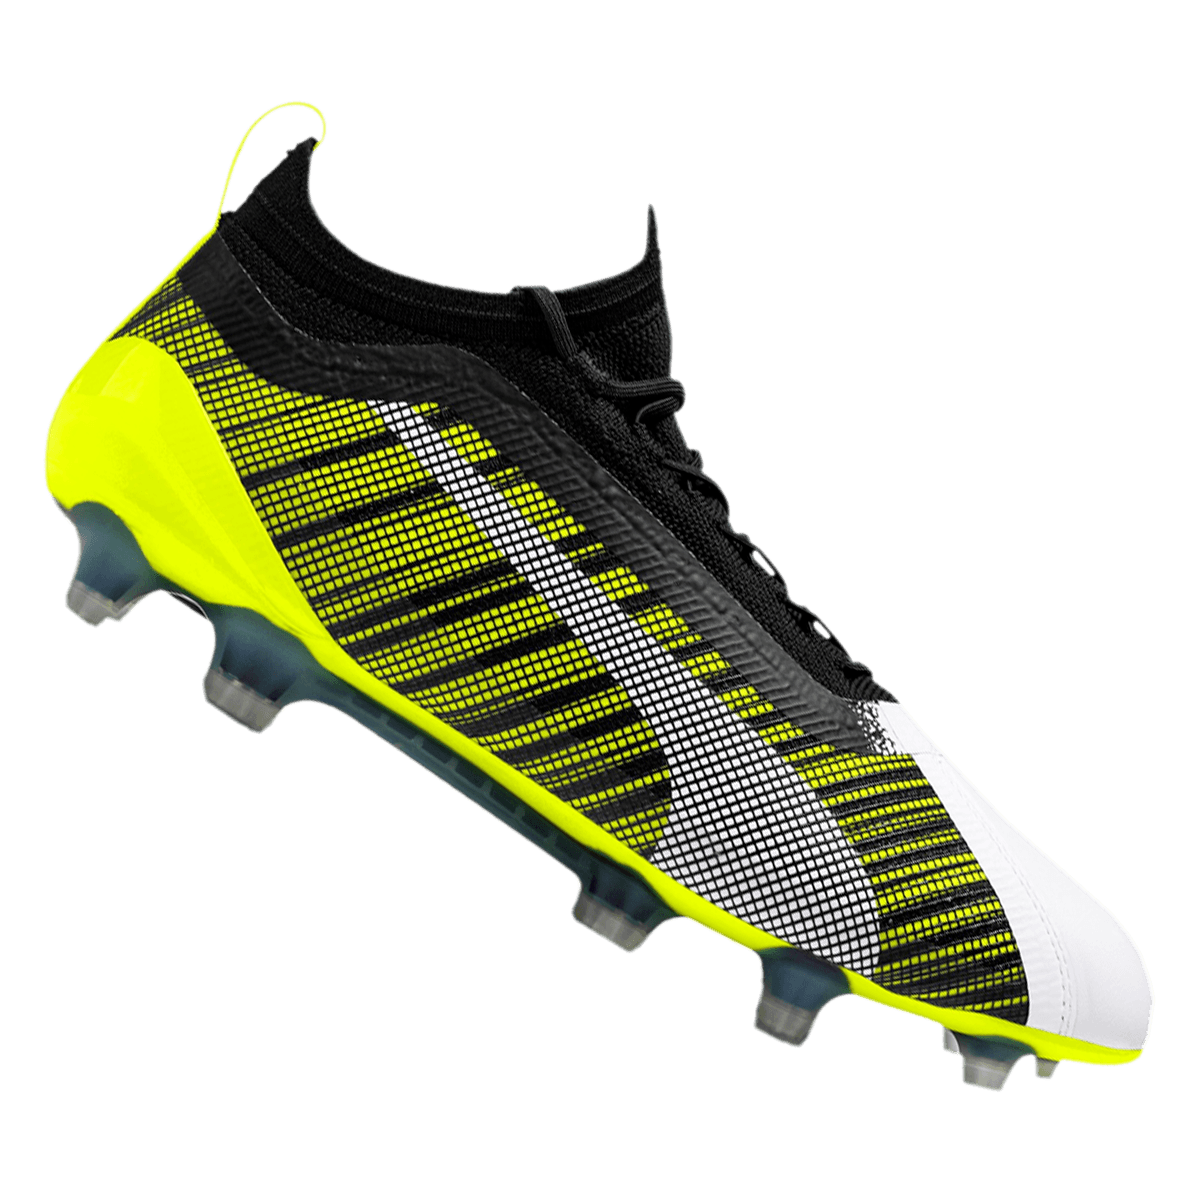 Puma Fußballschuh One 5.1 FGAG gelb fluoschwarz